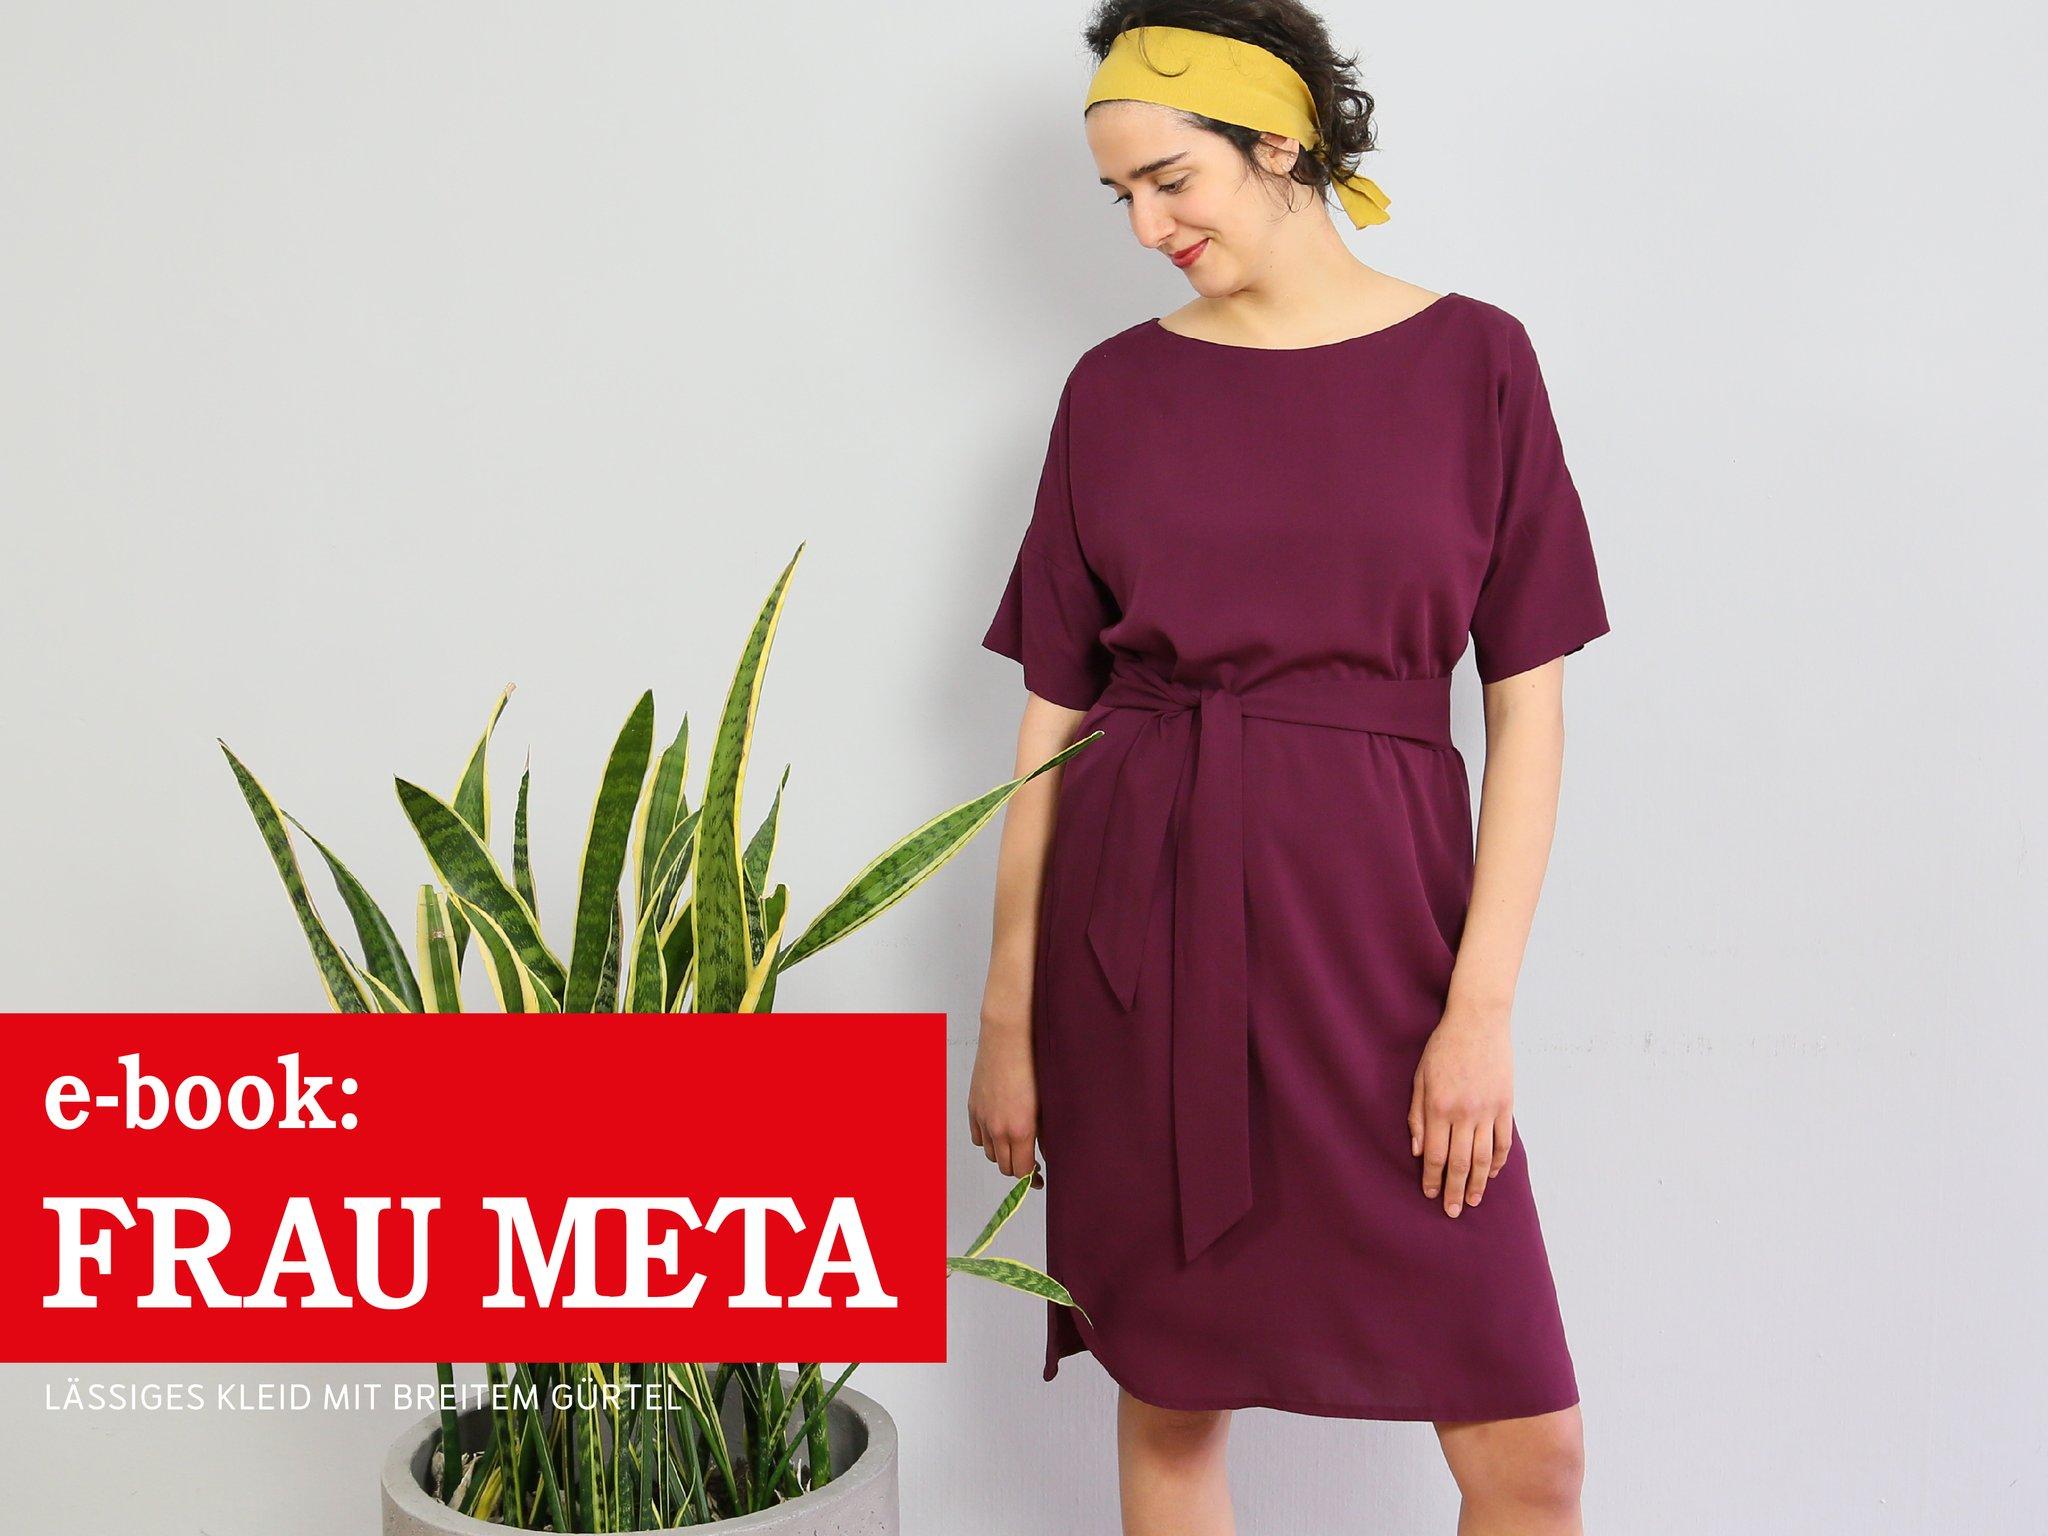 FRAU META • lässiges Kleid mit breitem Gürtel, e-book